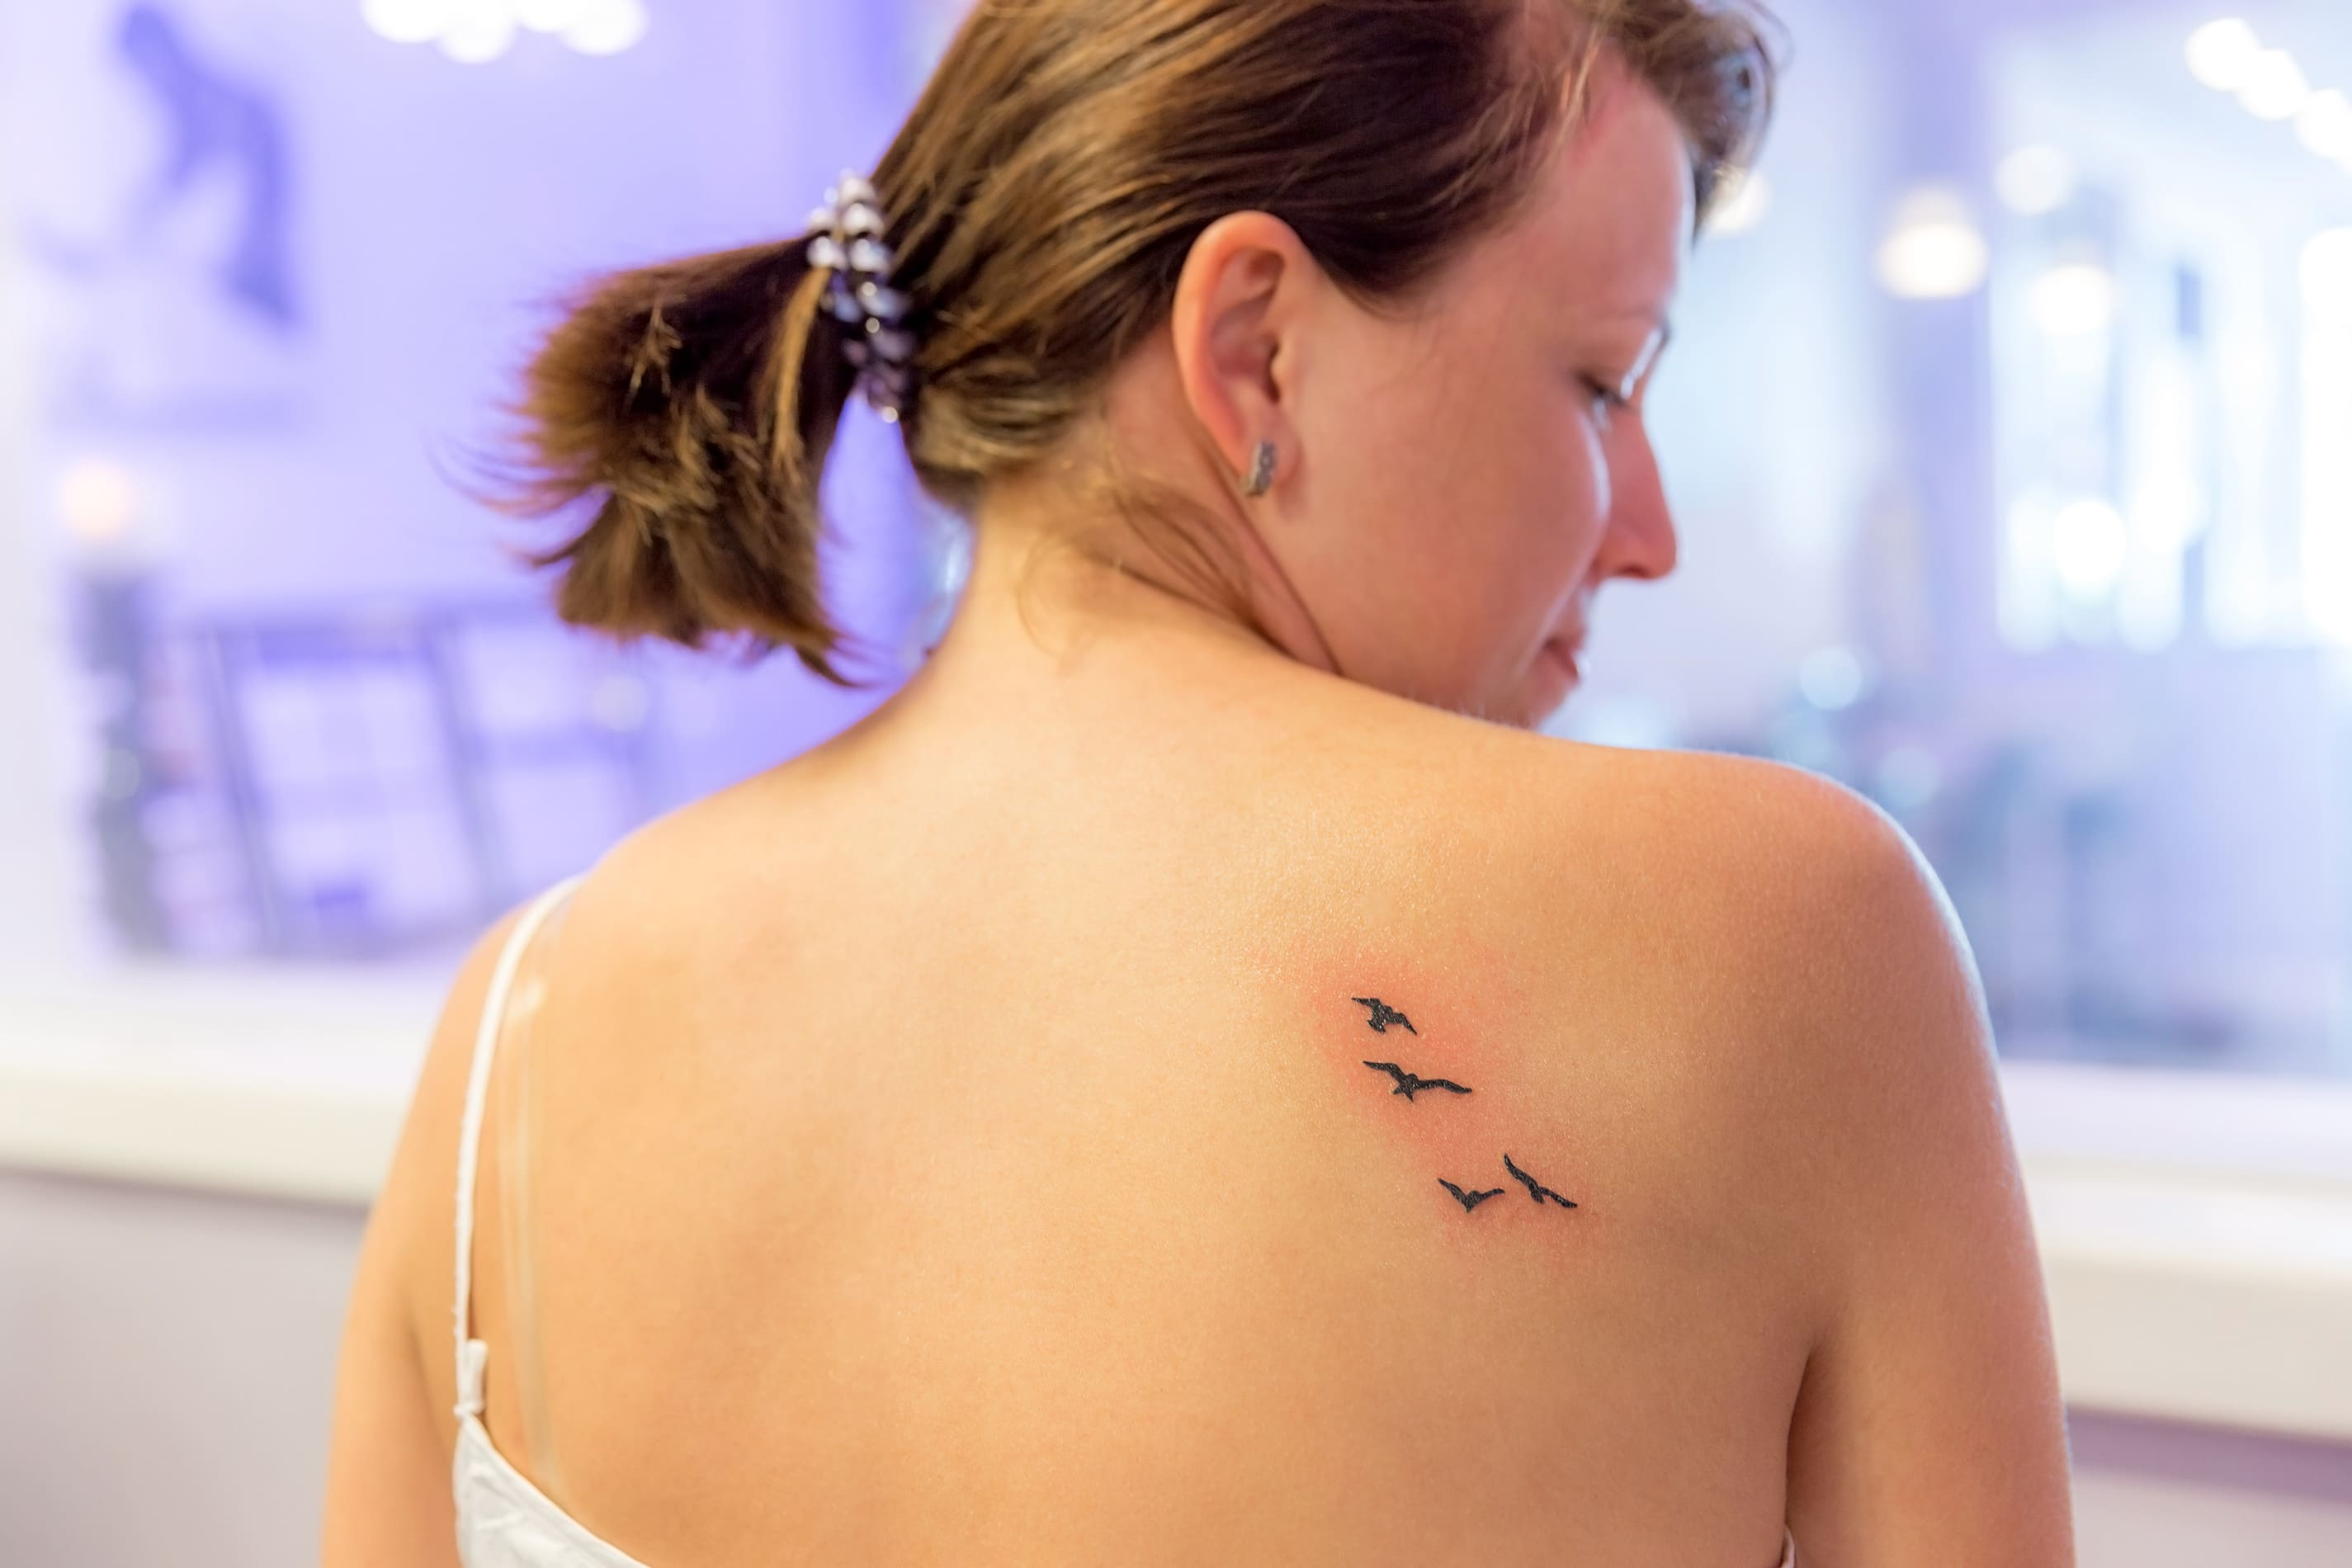 Tattoo Design Ideas for Girls - 8